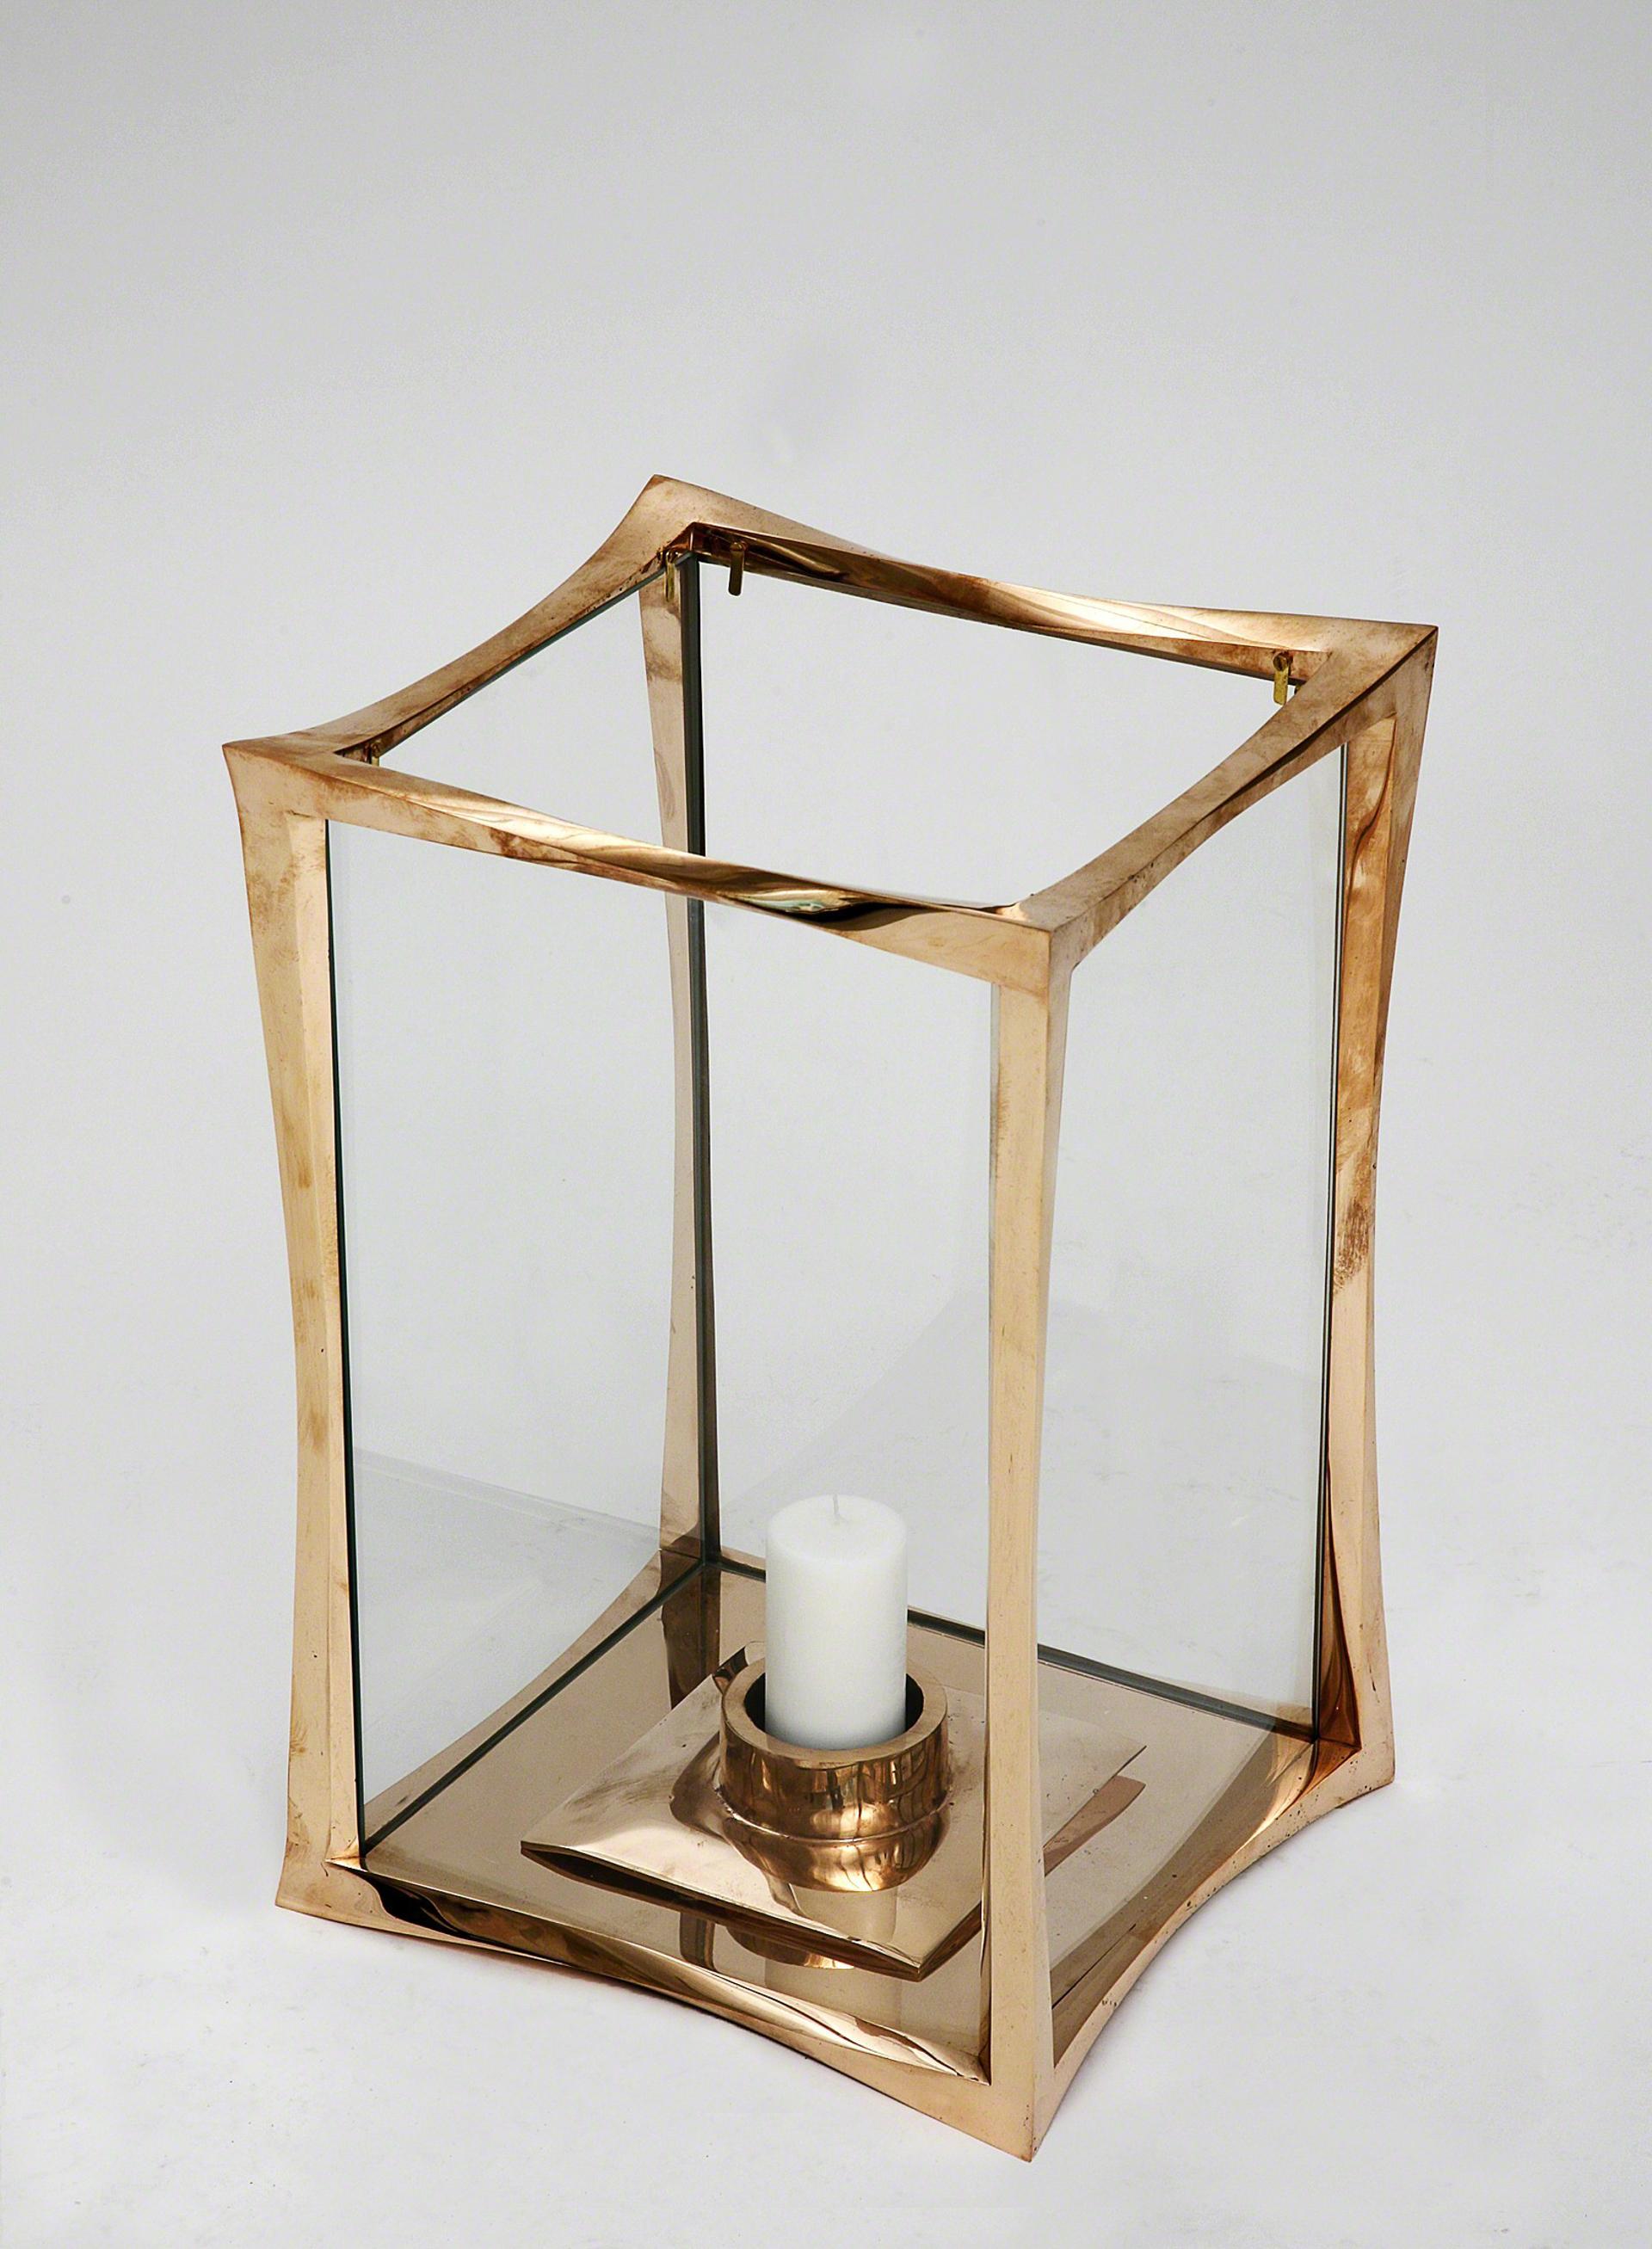 Lantern  by Anasthasia Millot